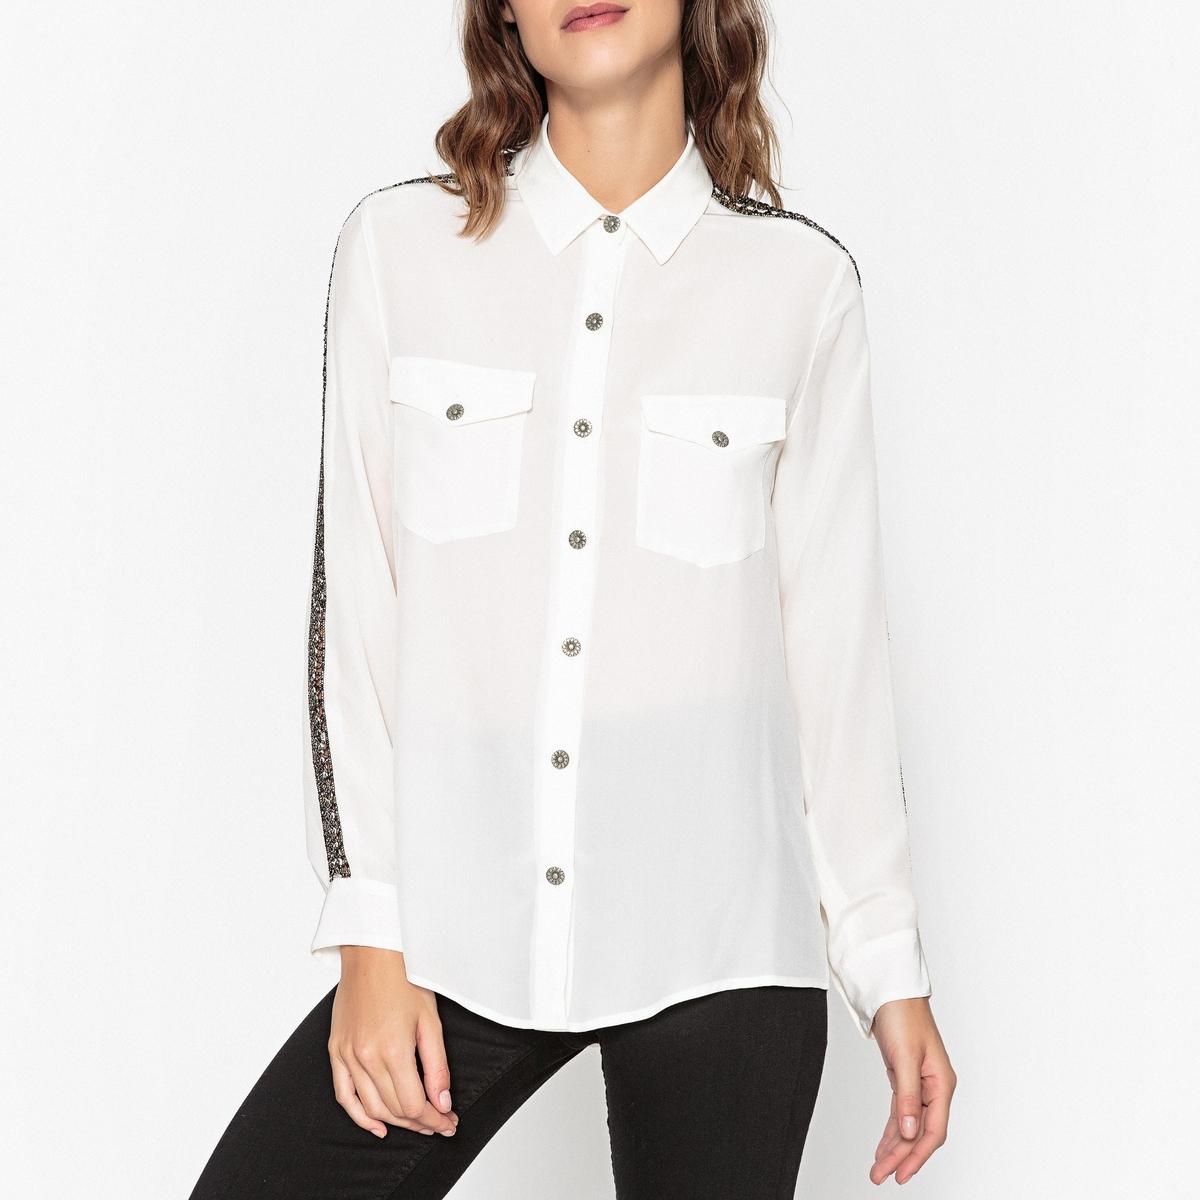 Рубашка с декоративной тесьмой на рукавах